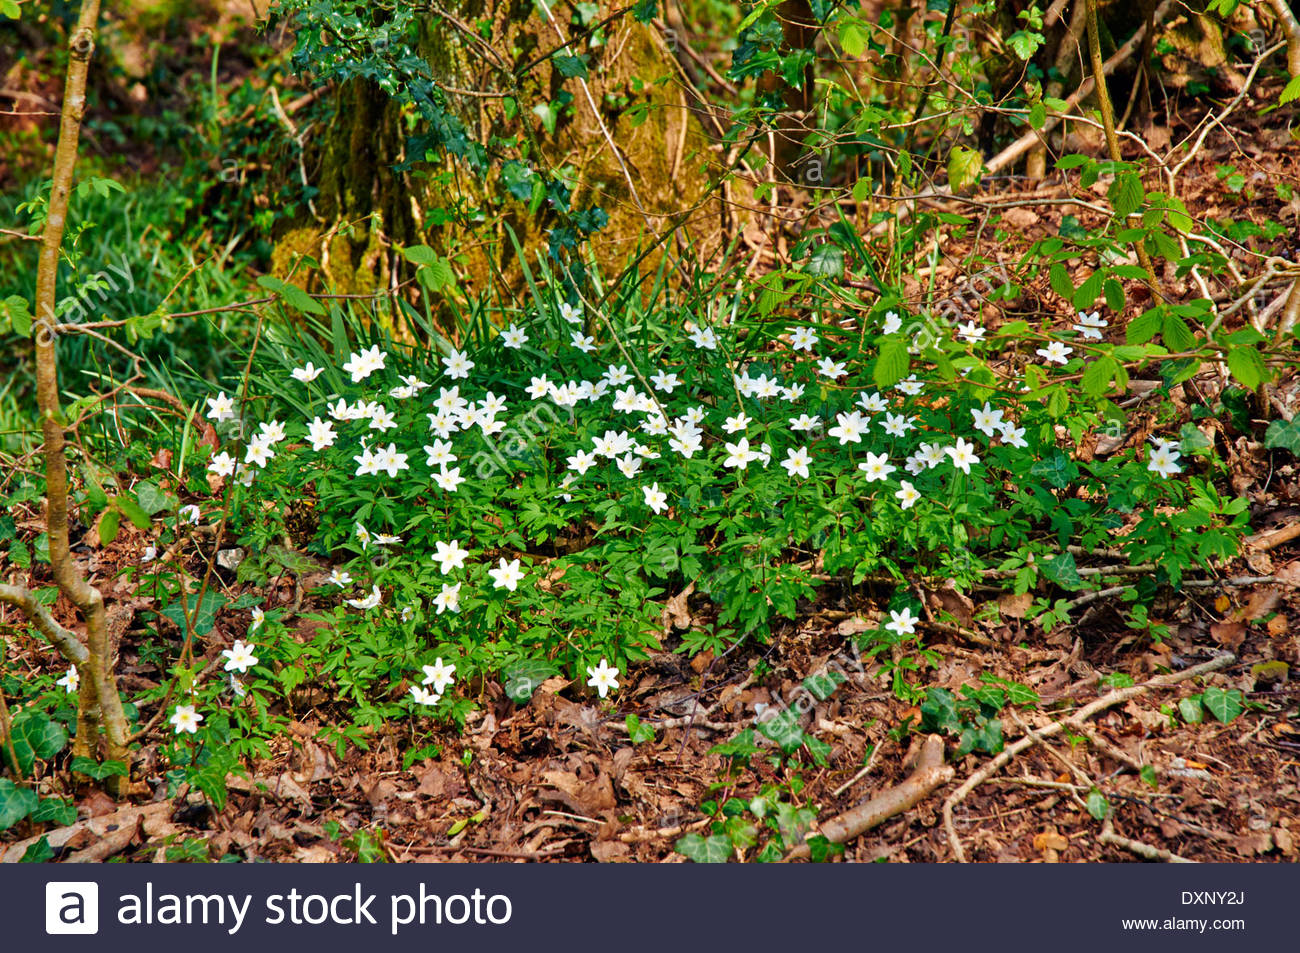 Fiori Bianchi Sottobosco.Legno Anemone Nemorosa Primavera Fiori Bianchi Foglie Verdi